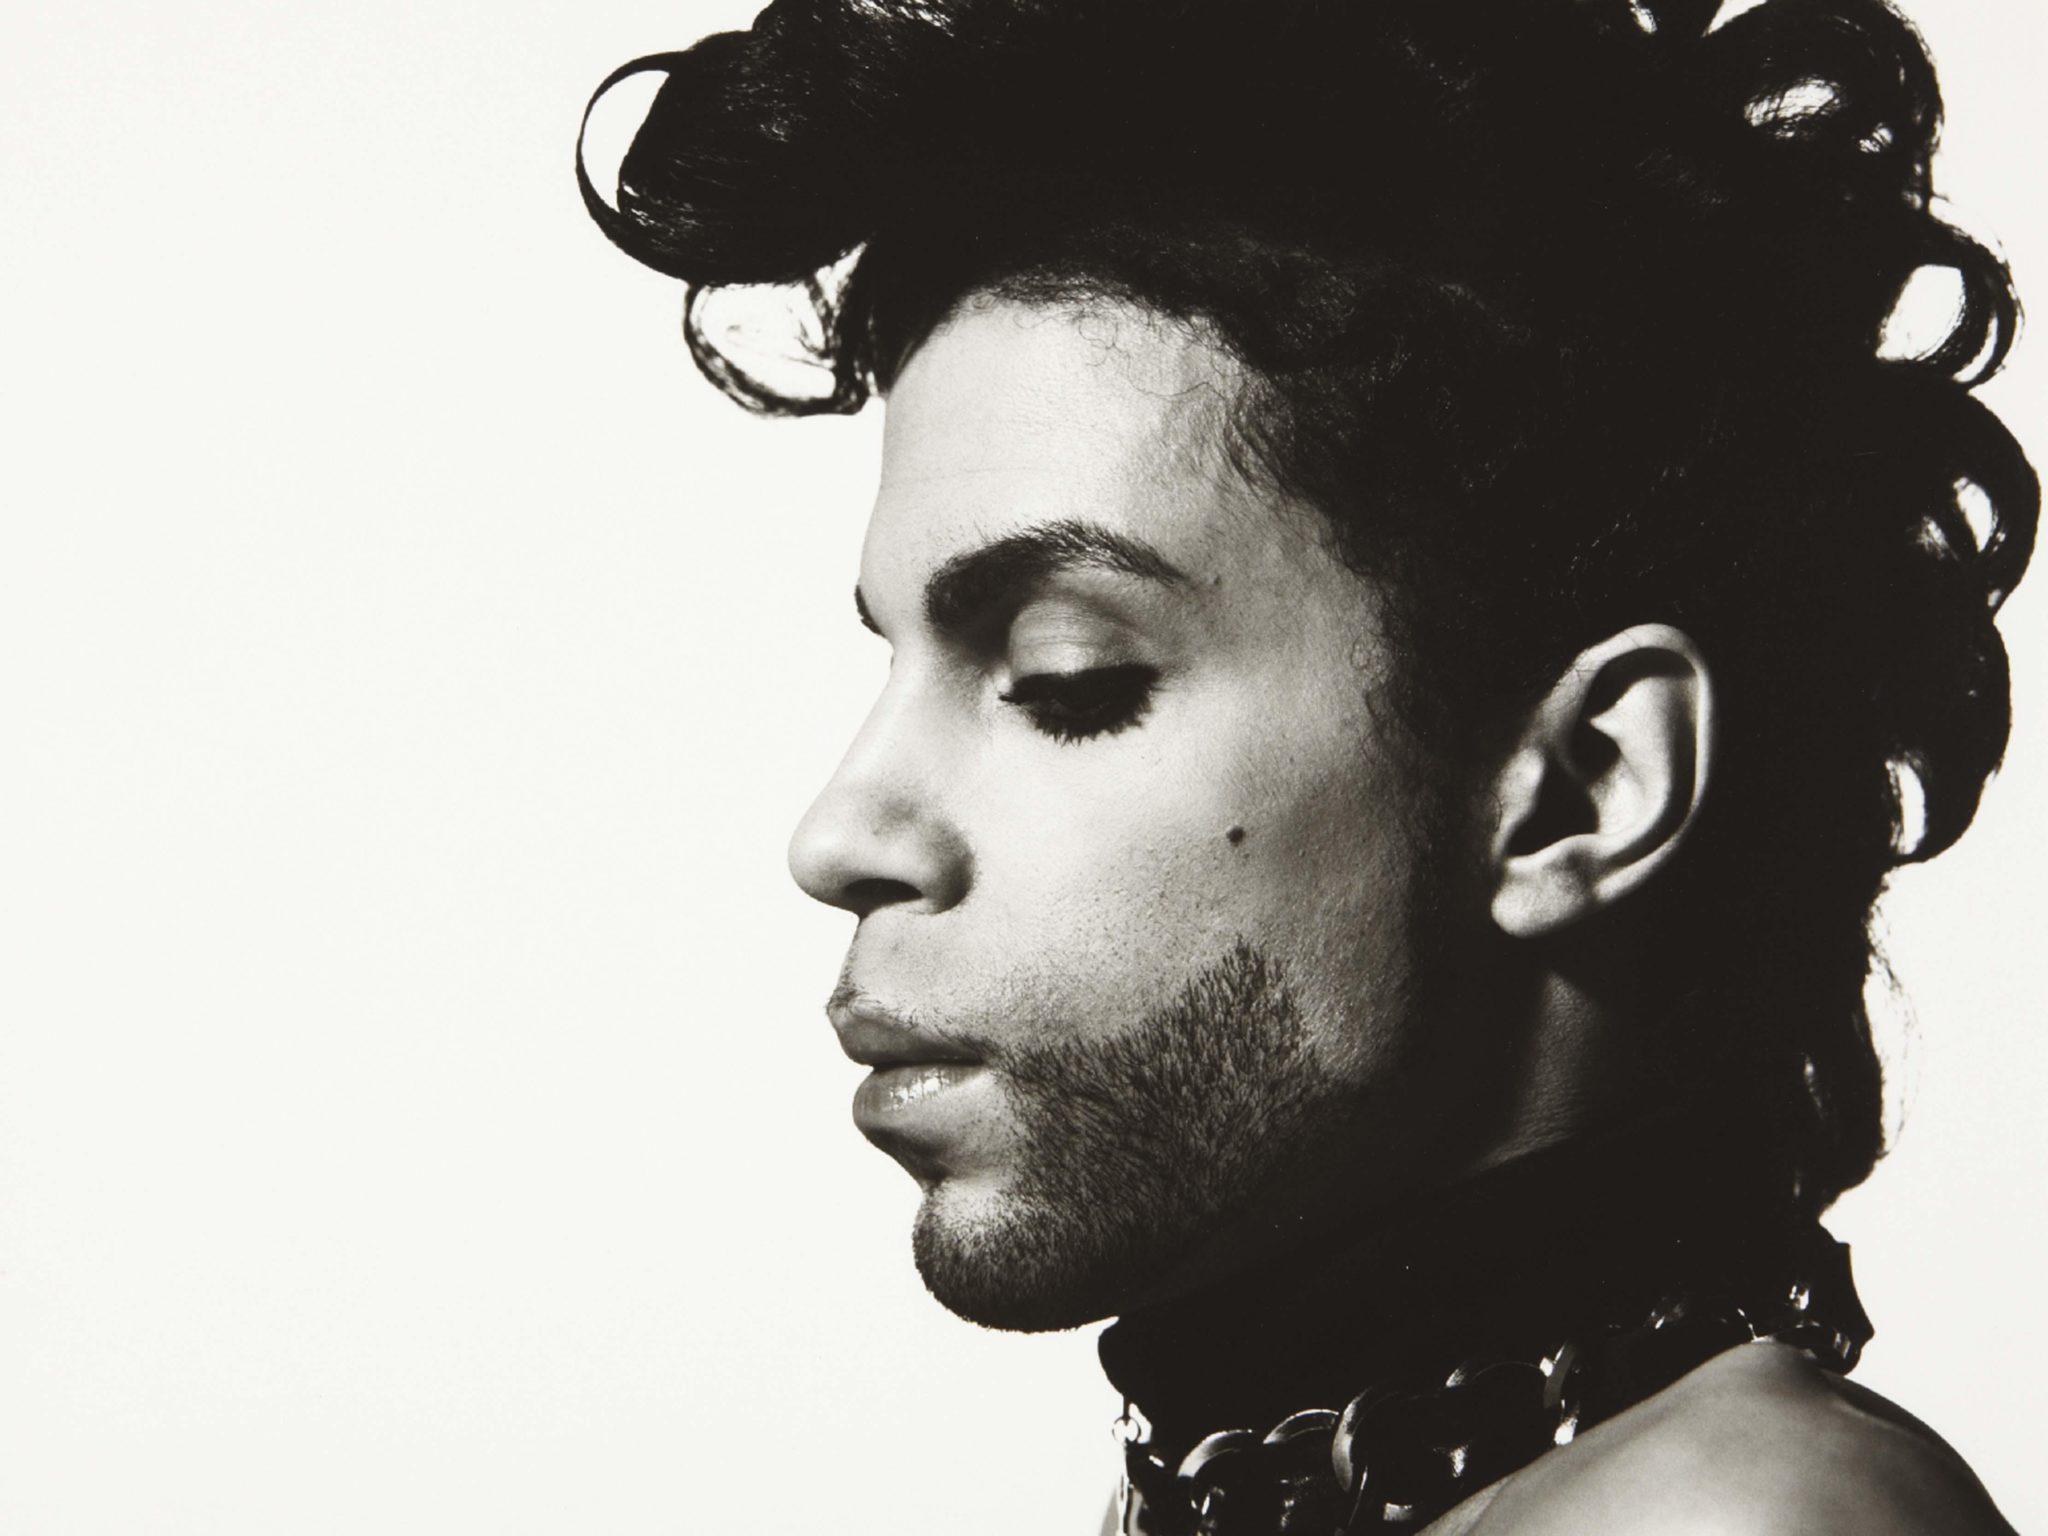 Le due anime di Prince